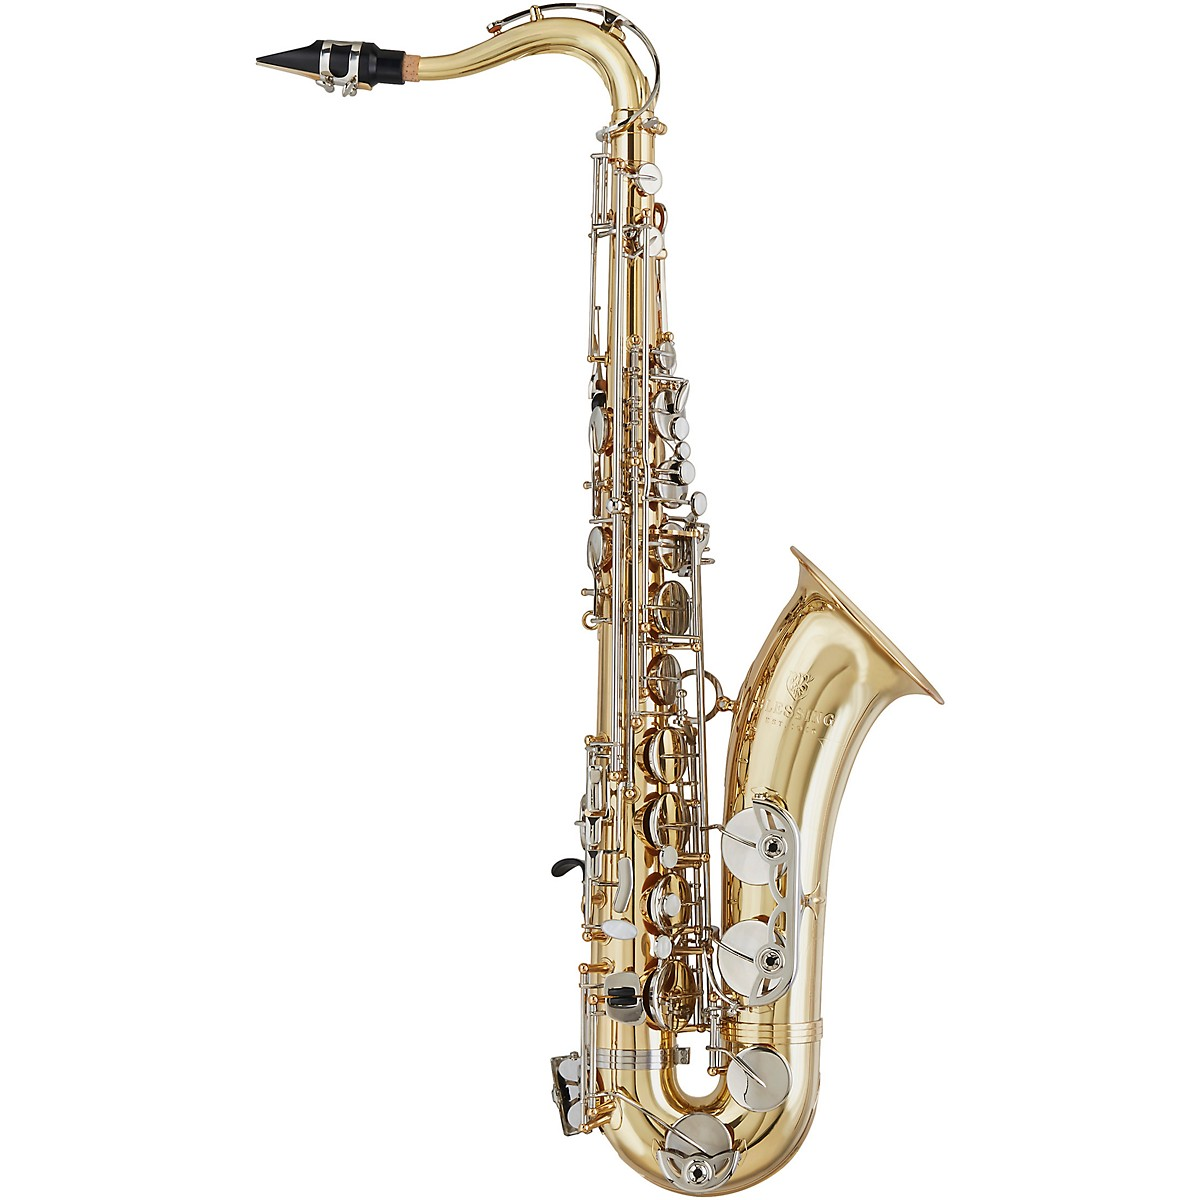 Blessing BTS-1287 Standard Series Bb Tenor Saxophone